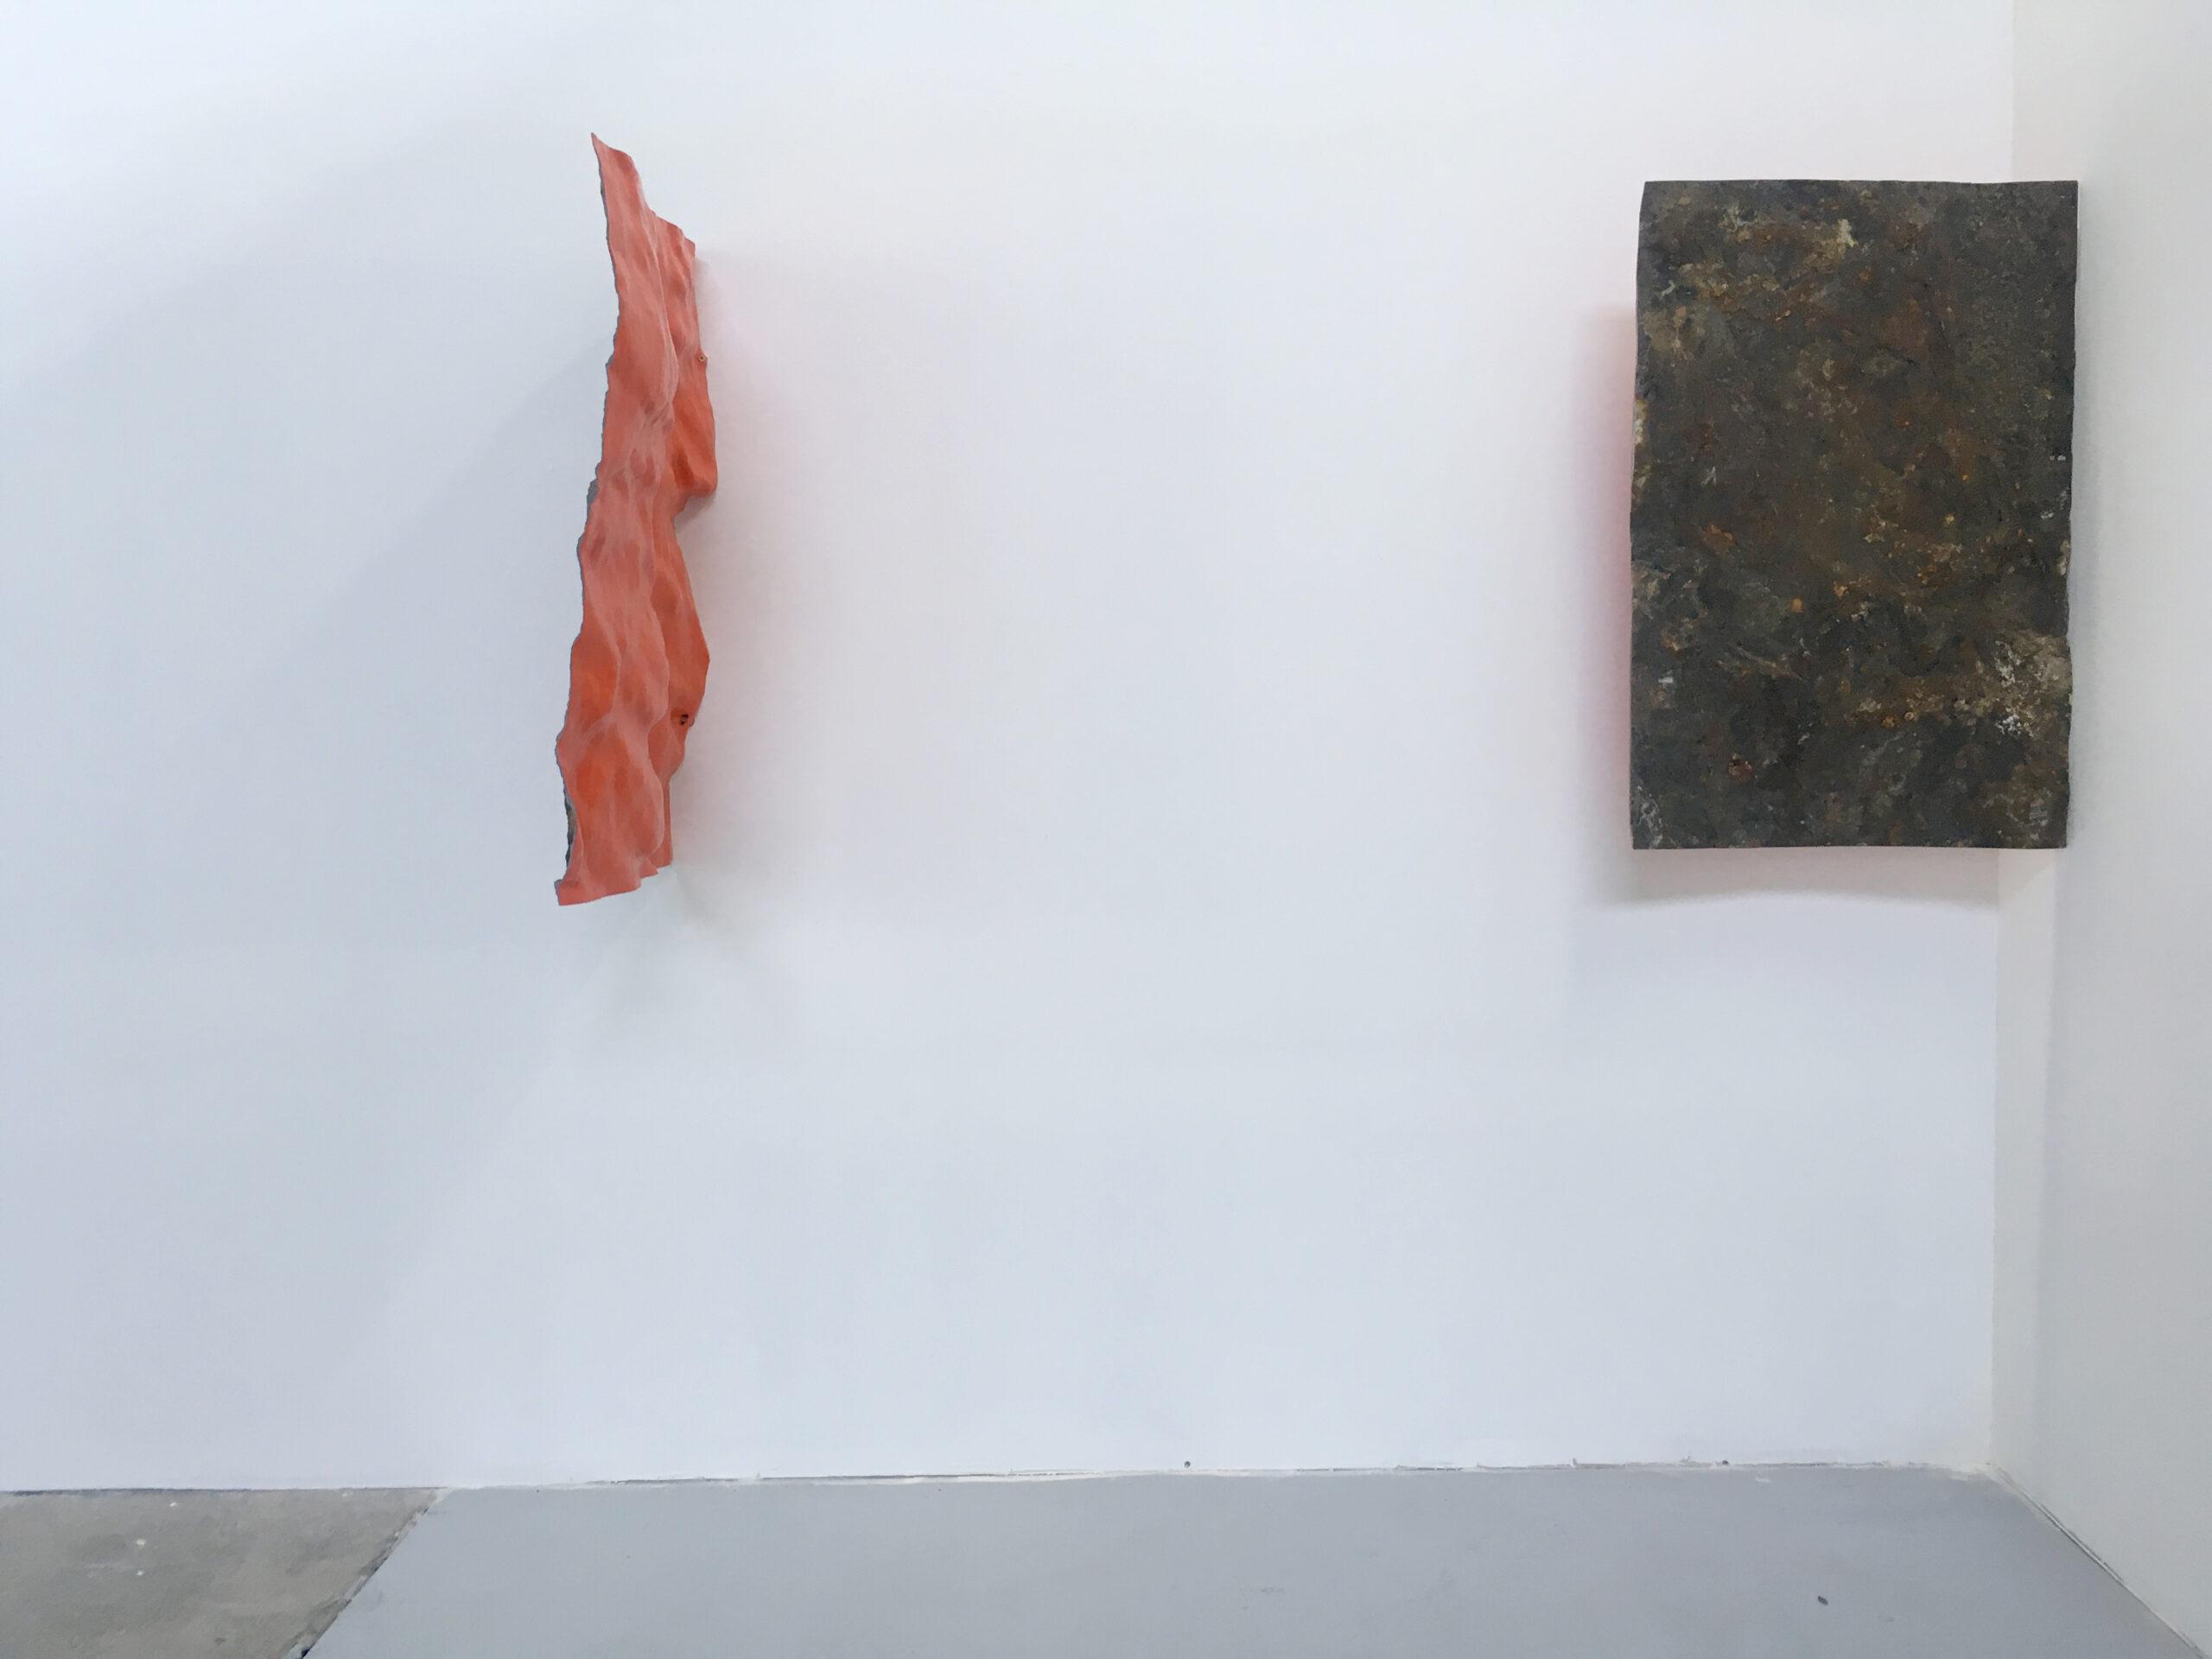 Liminal, 2018. Resina, fibra de vidrio, pintura poliuretano. 80 x 60 cm: 75 x 60 cm